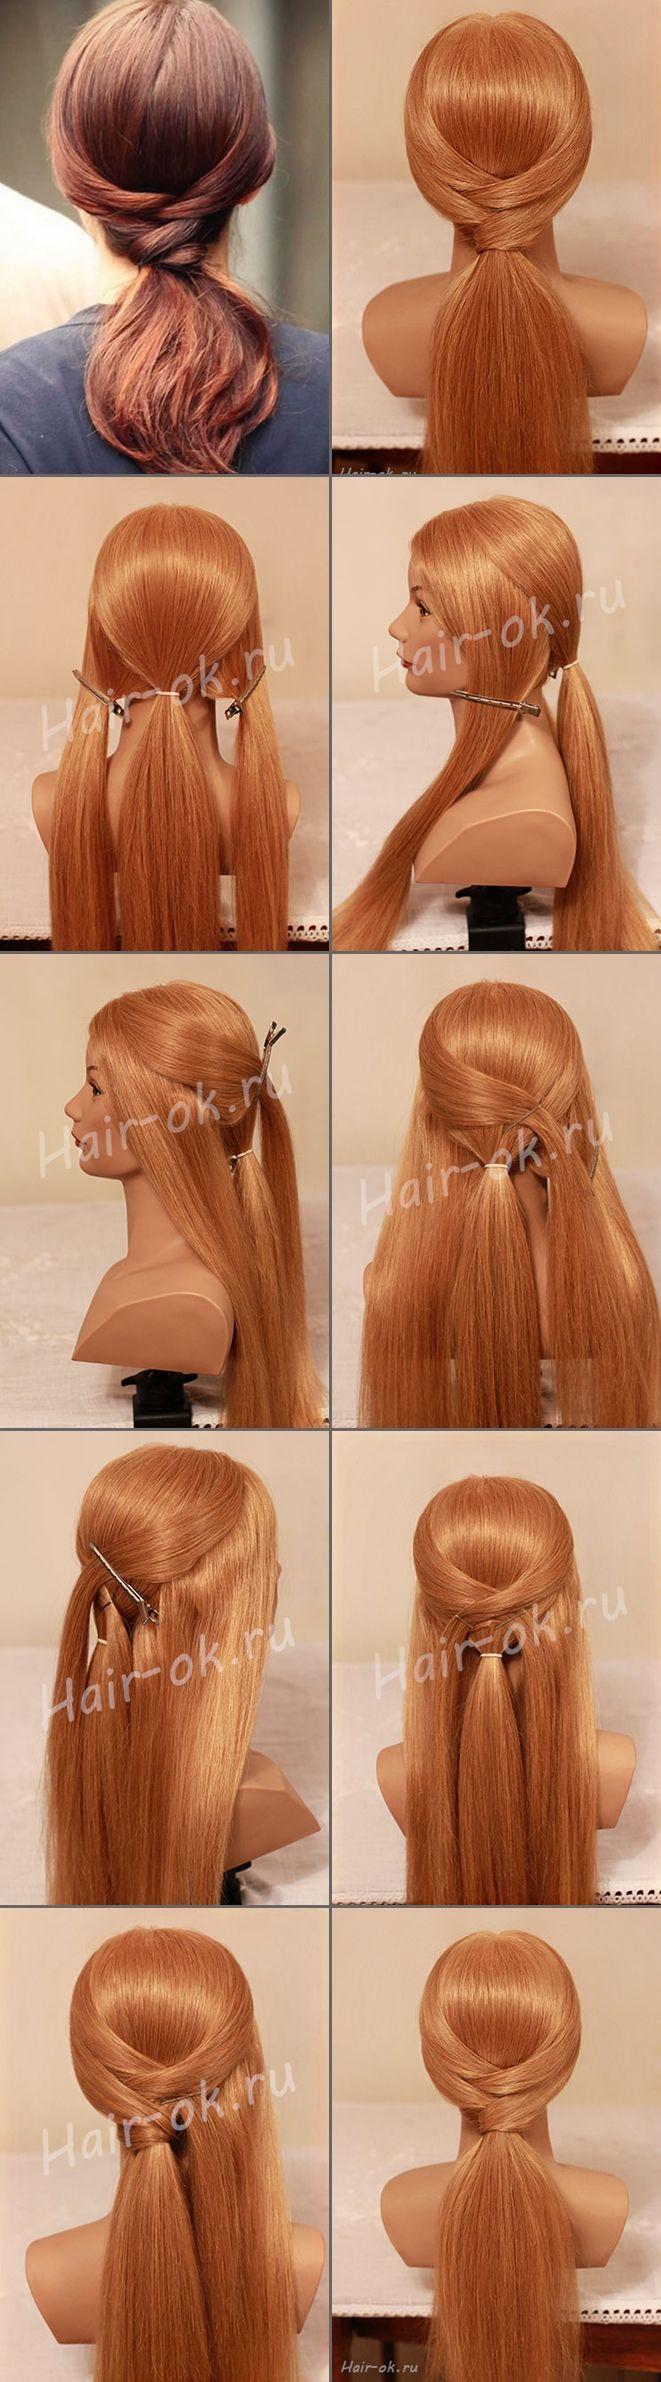 DIY Gossip Girl Hairstyles 1   www.FabArtDIY.com LIKE Us on Facebook ==> https://www.facebook.com/FabArtDIY